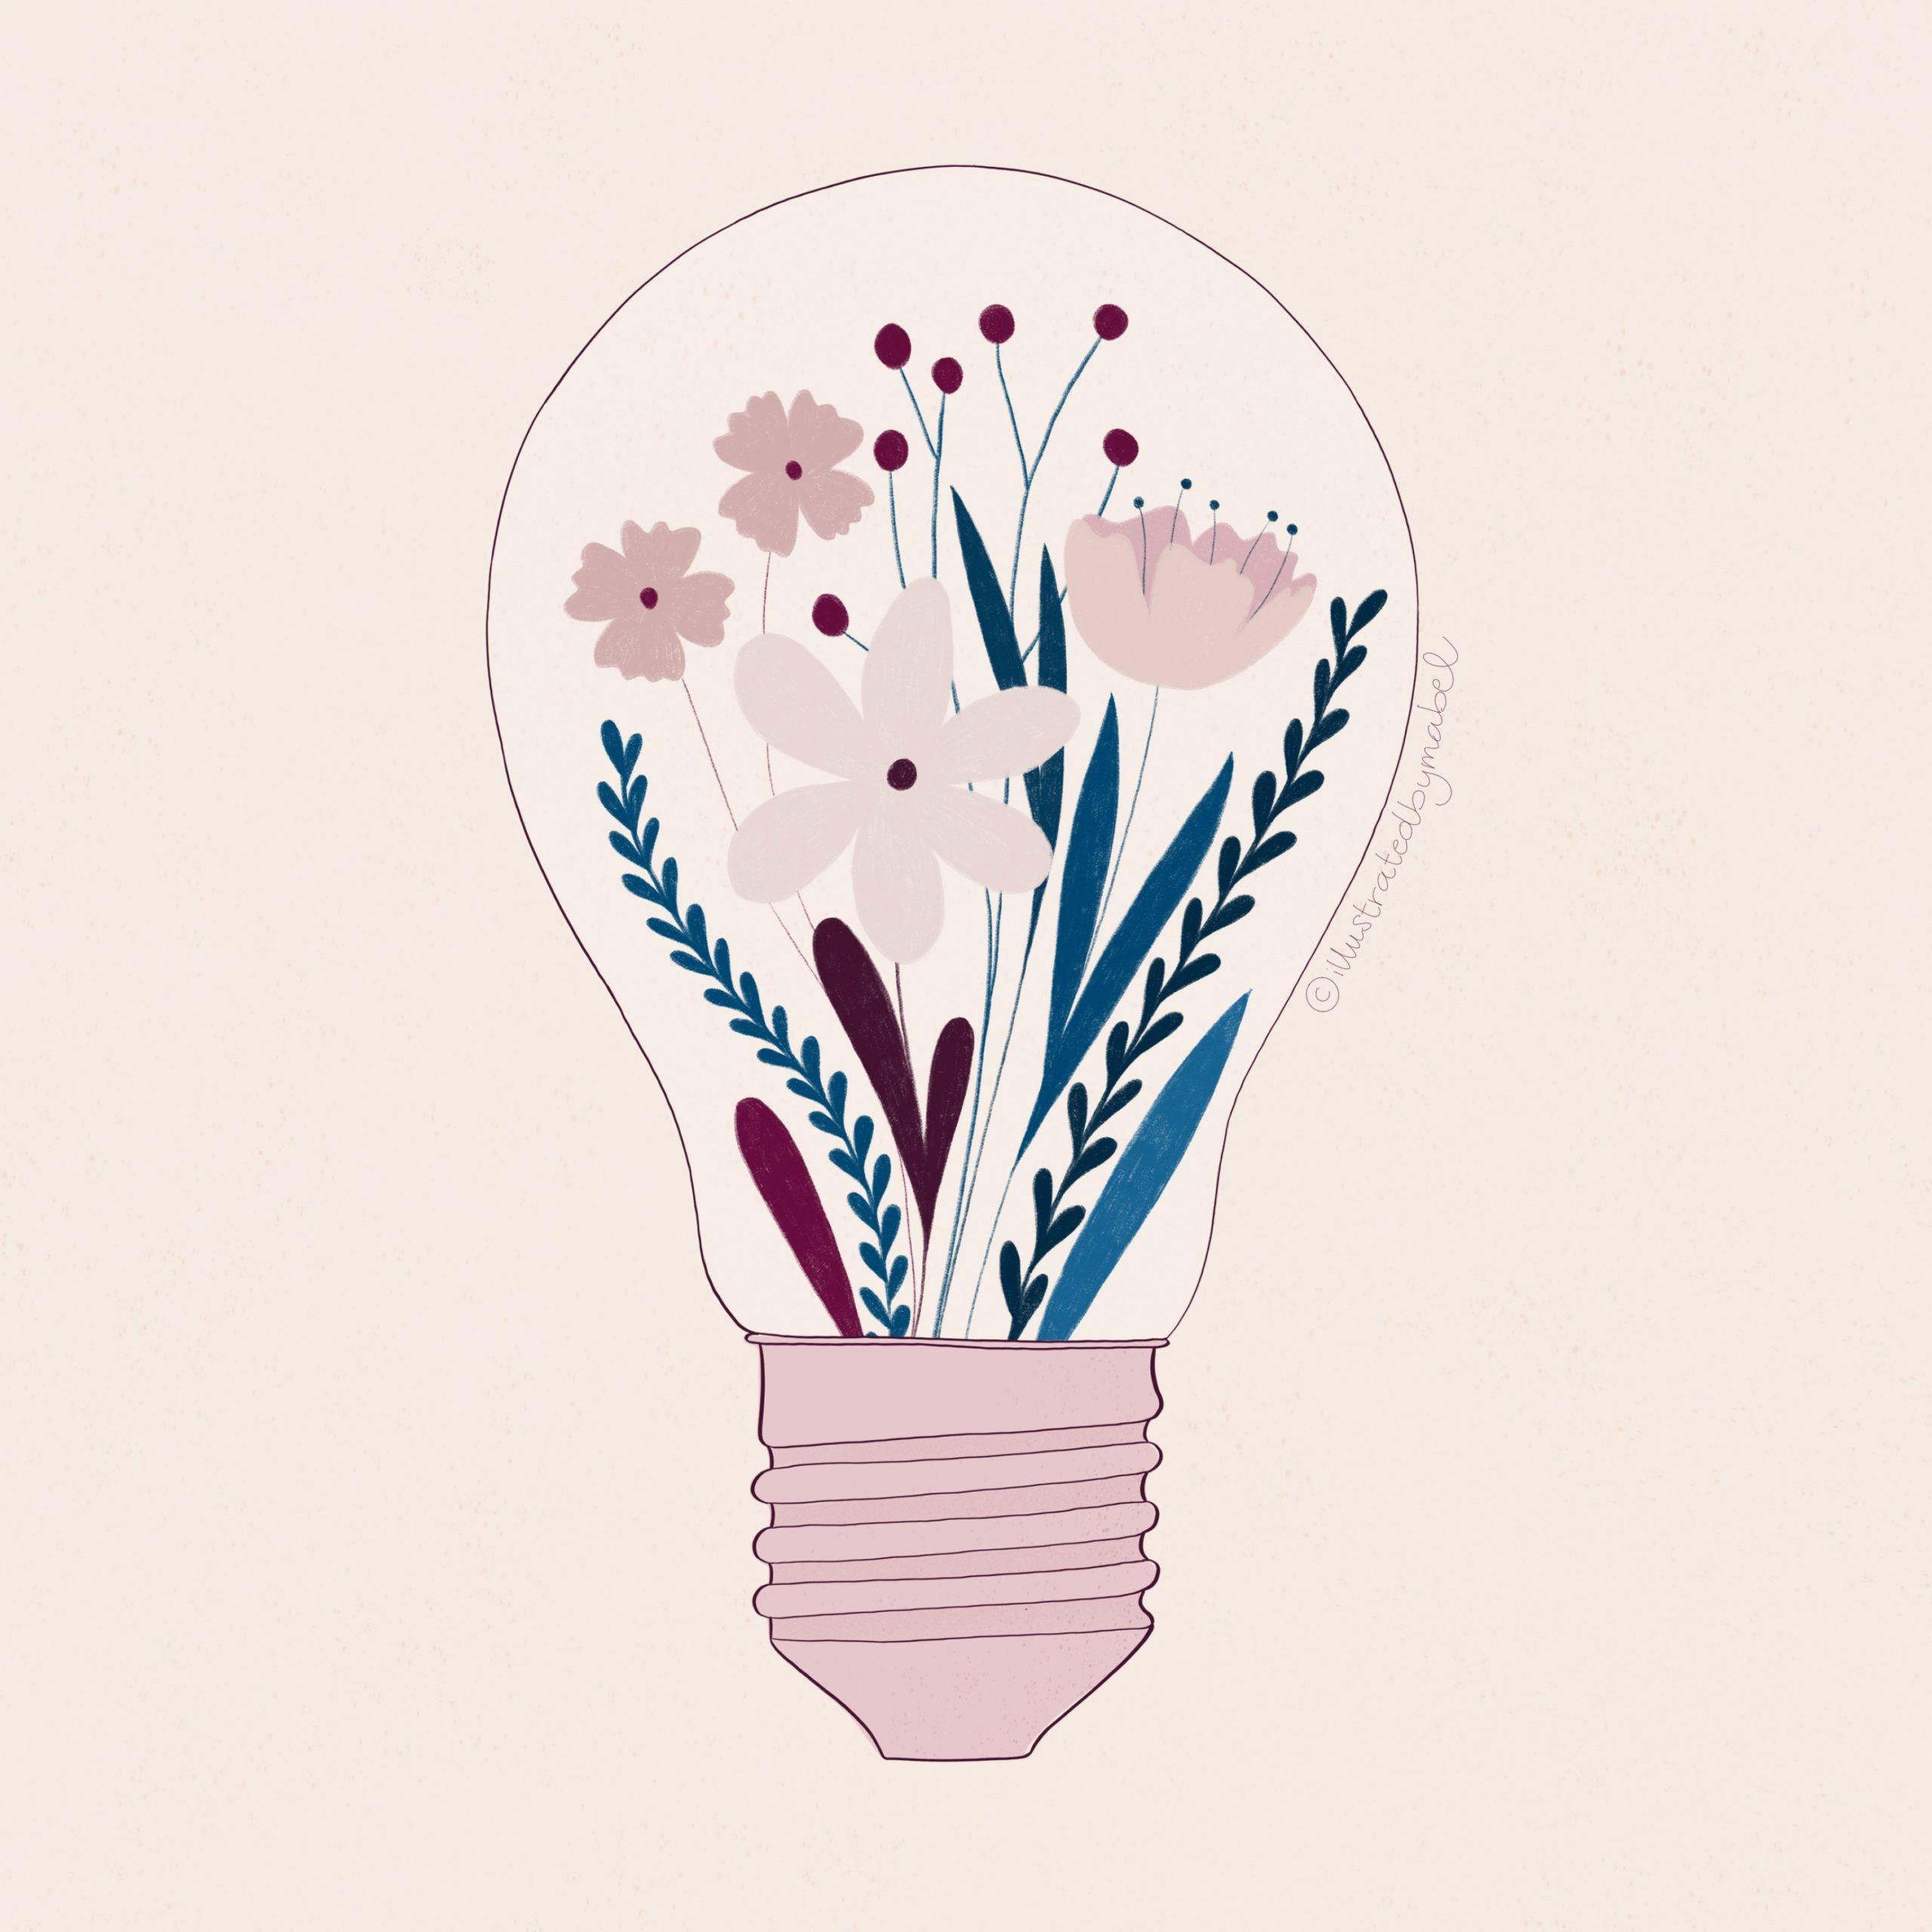 Custom illustration services. Light bulb with flowers inside